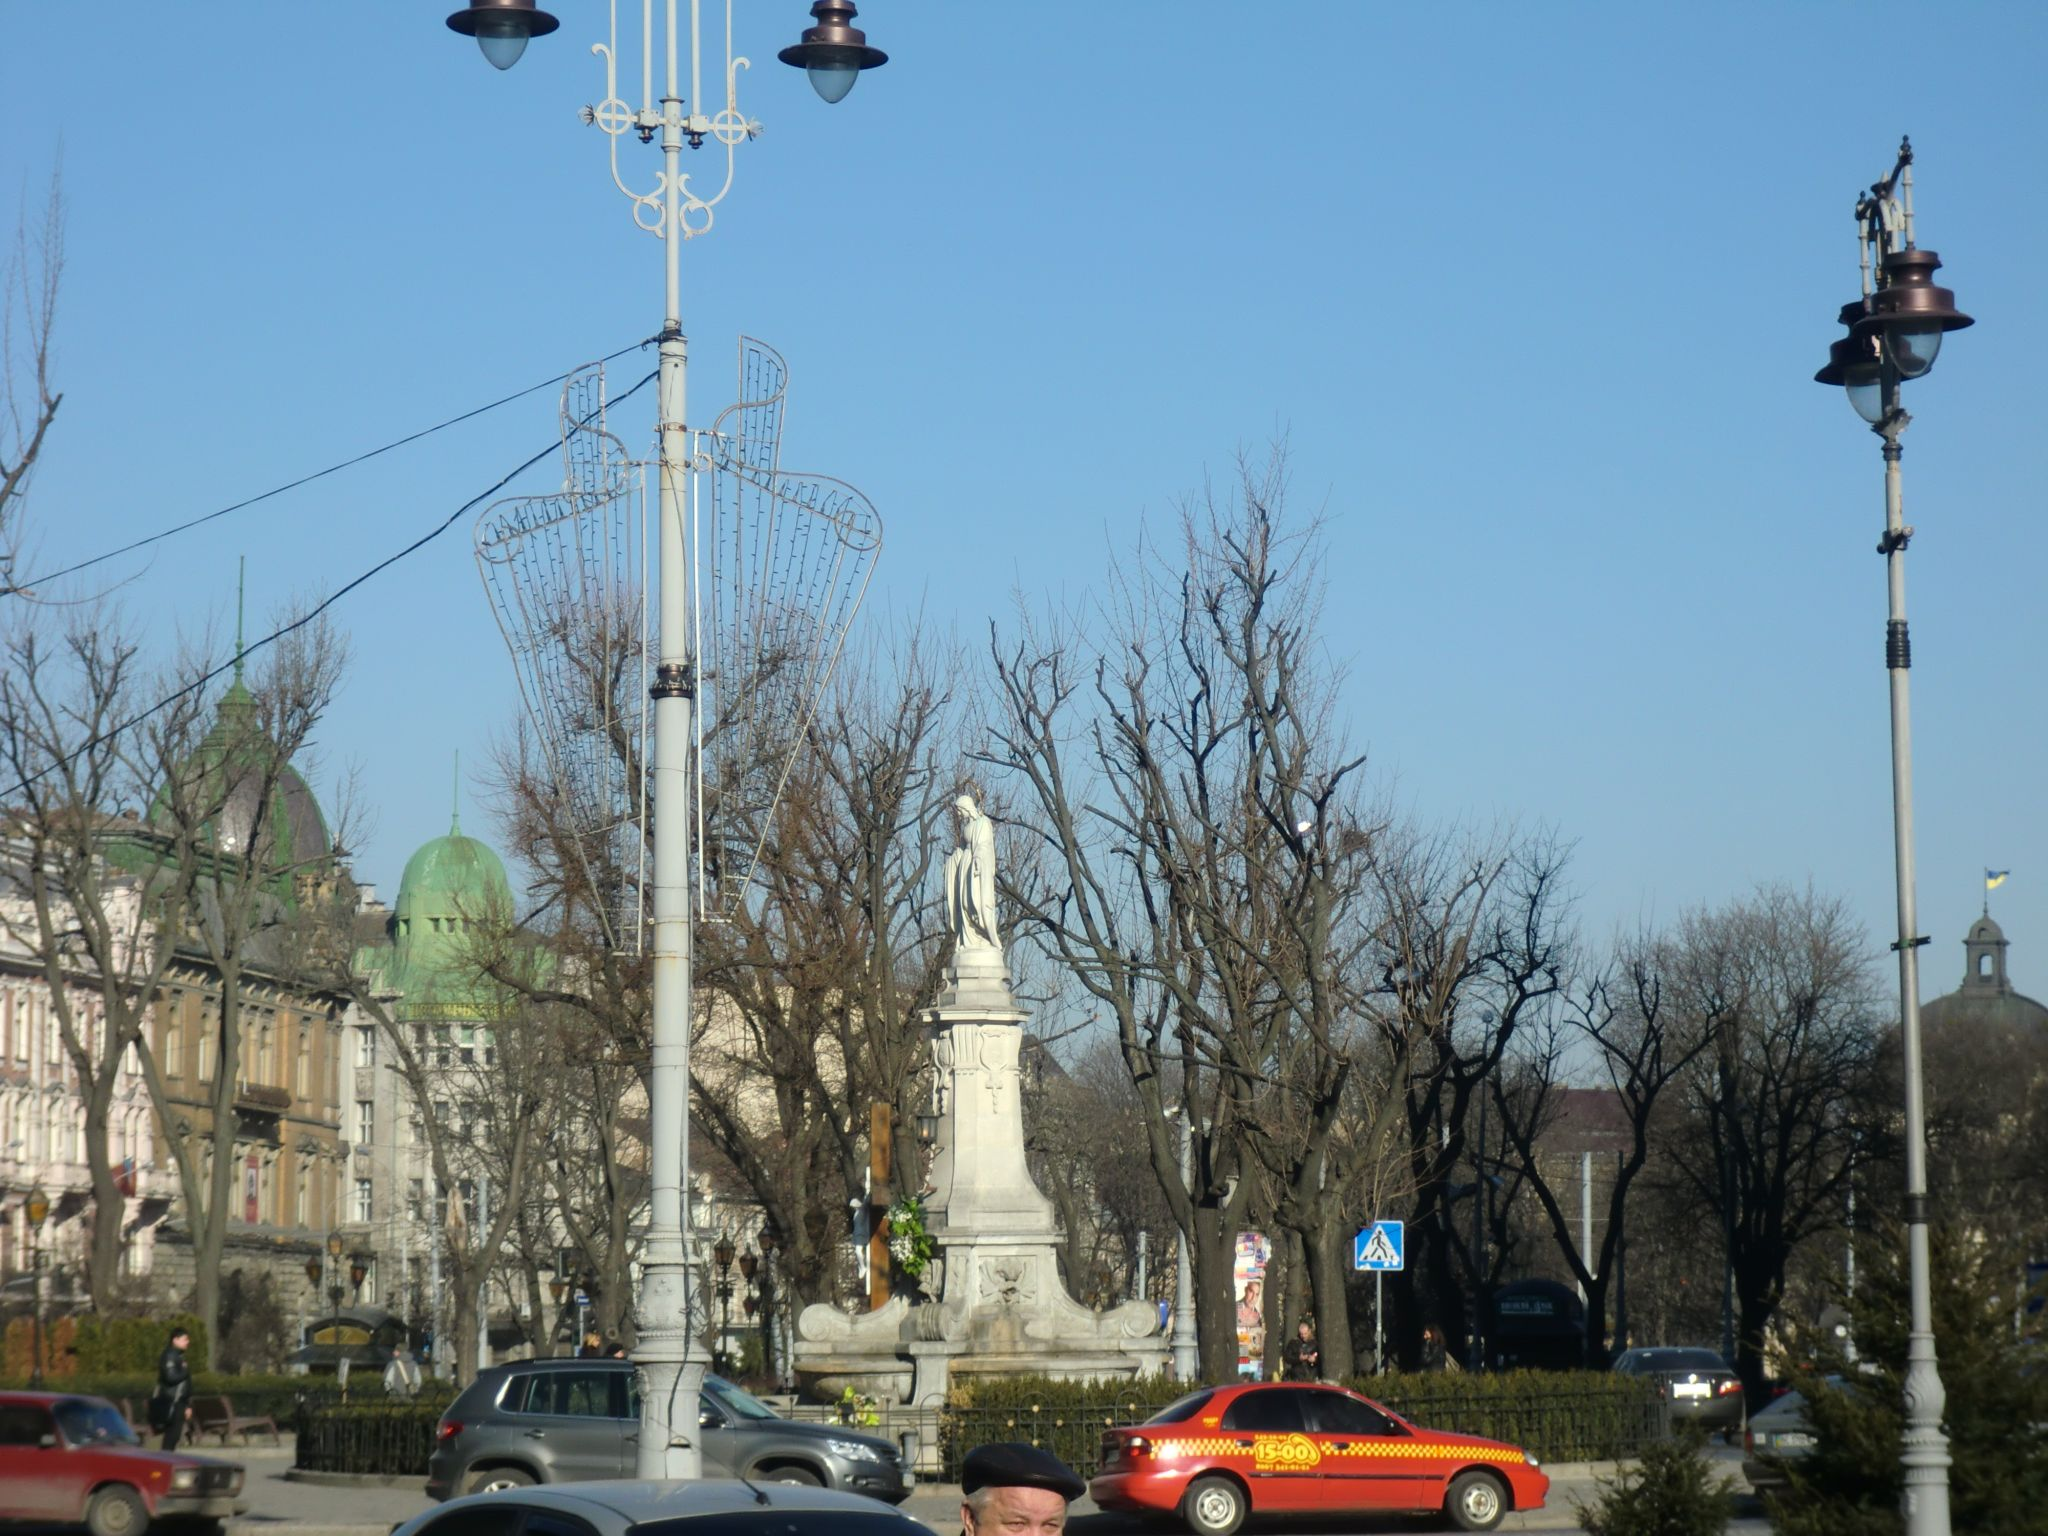 Lviv buildings 5 - Lviv, the Ukrainian pearl